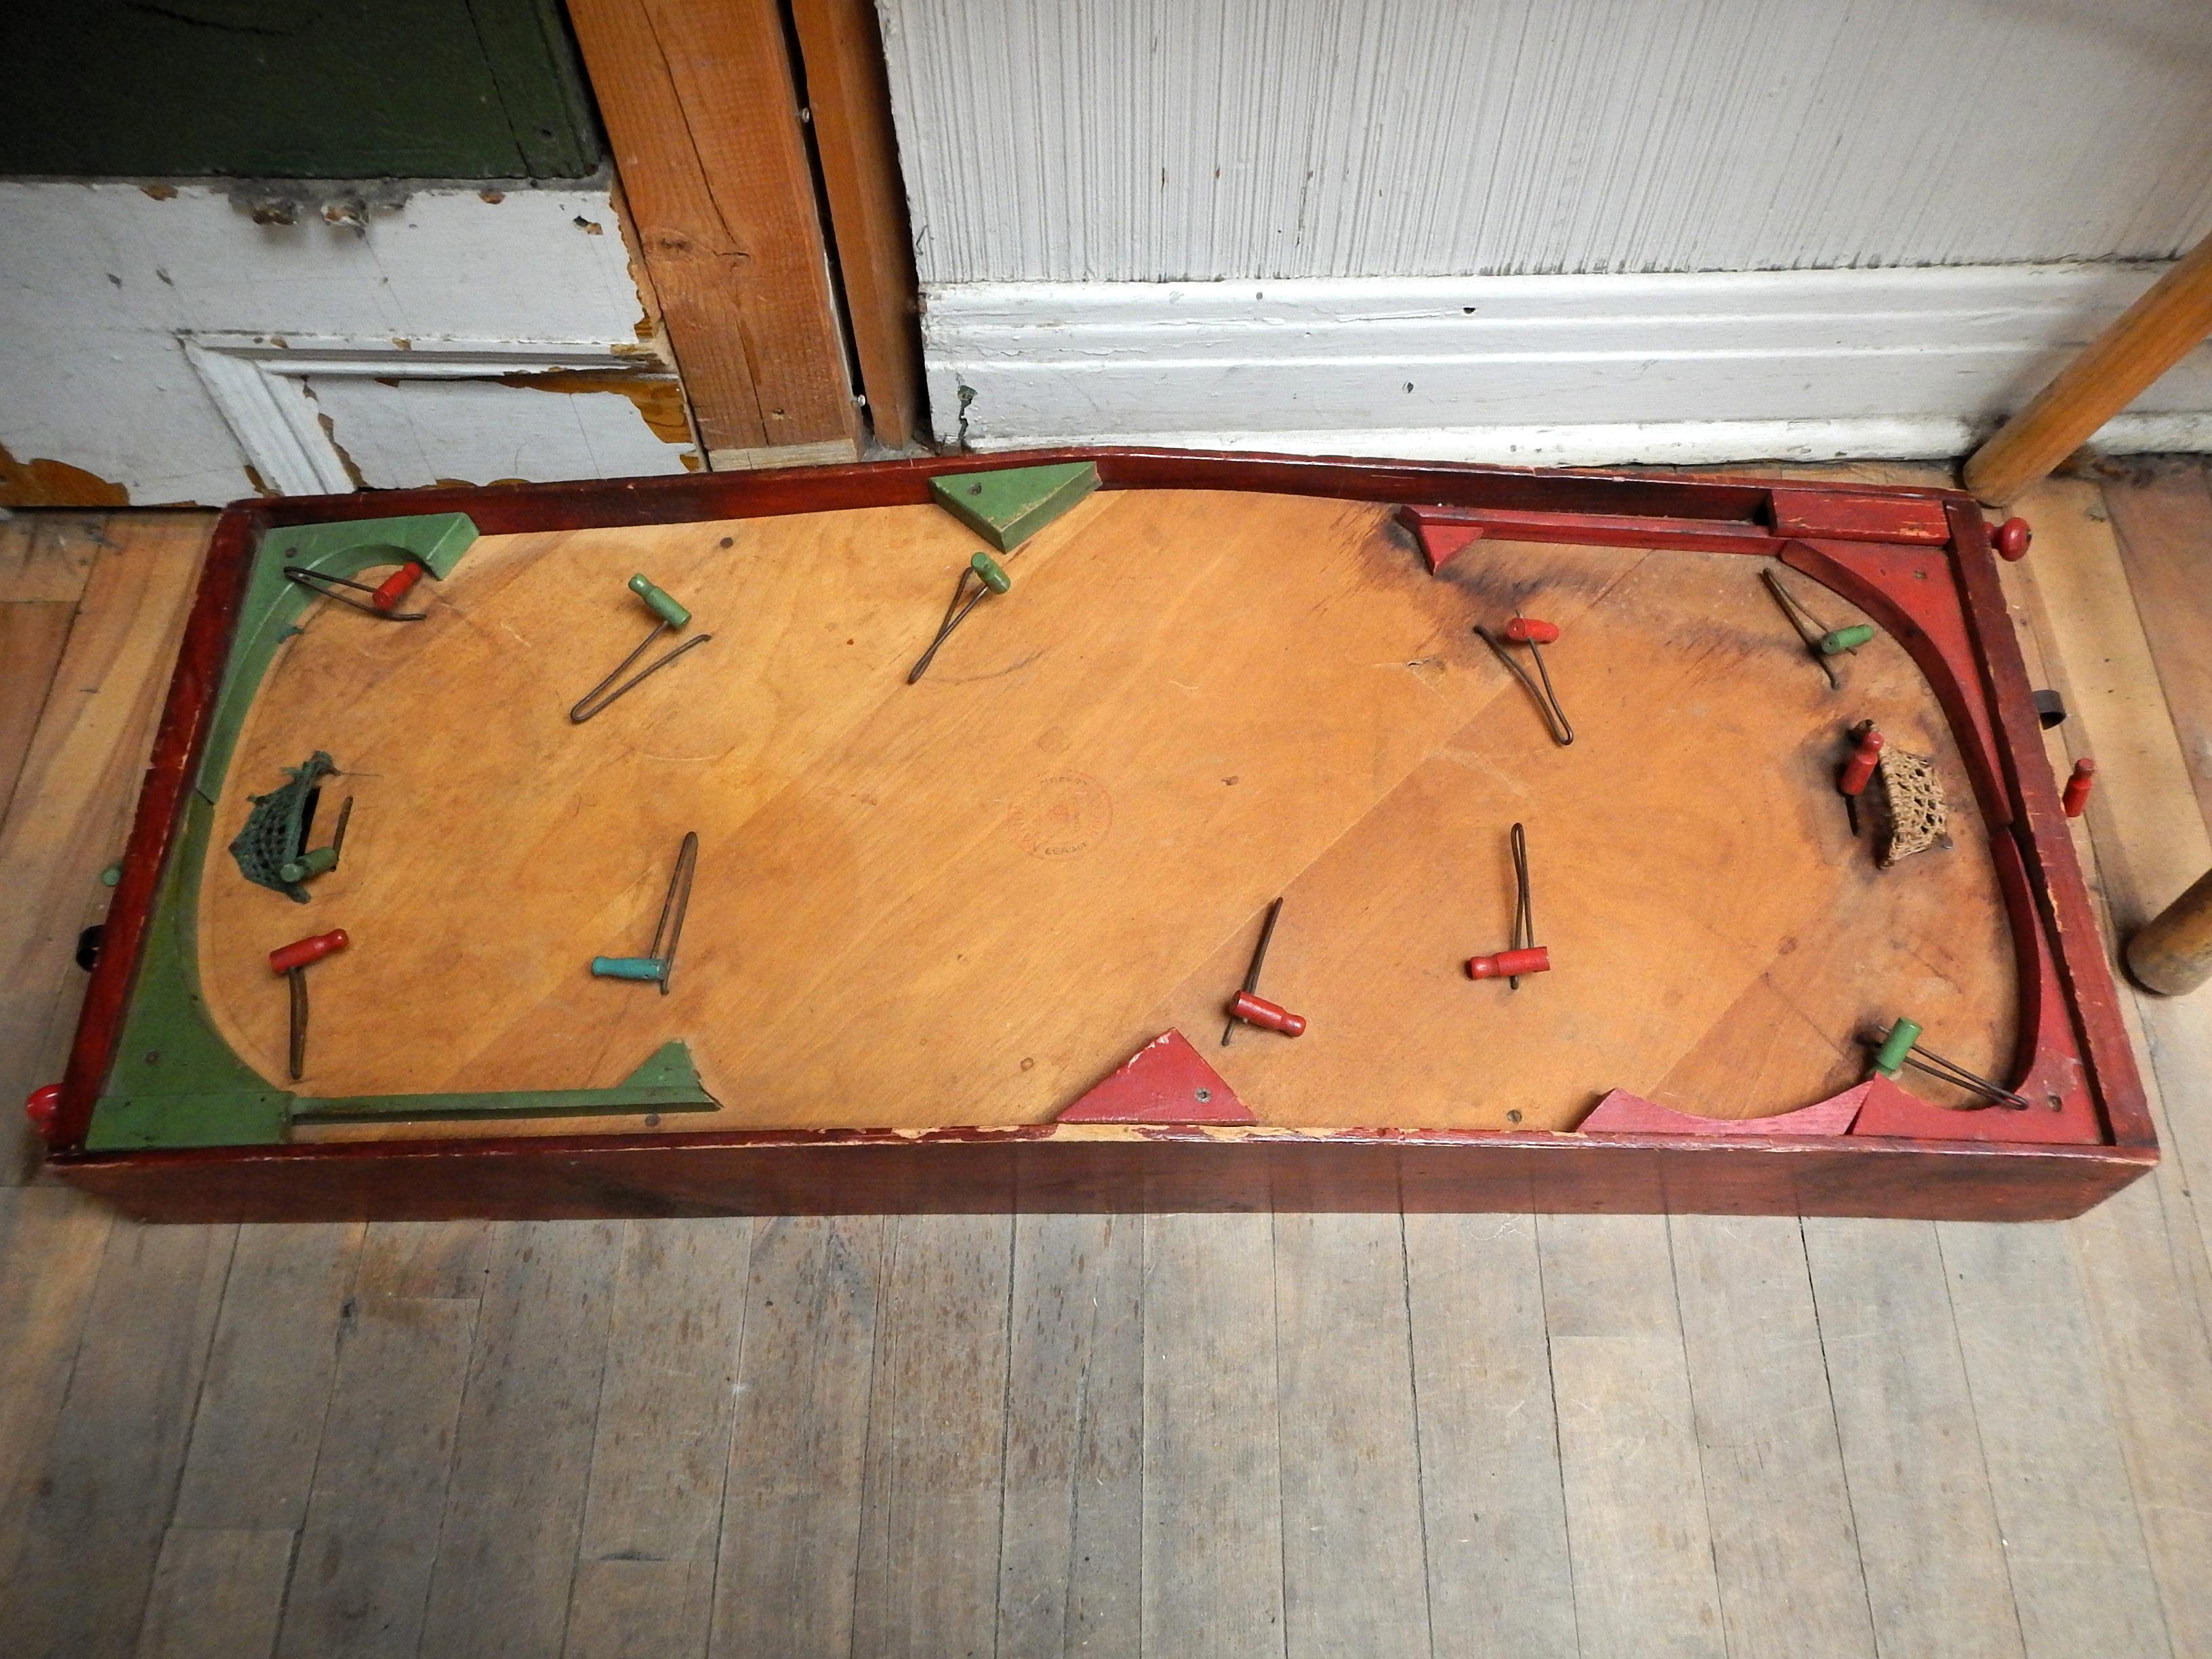 Vintage table hockey - Dscn0823